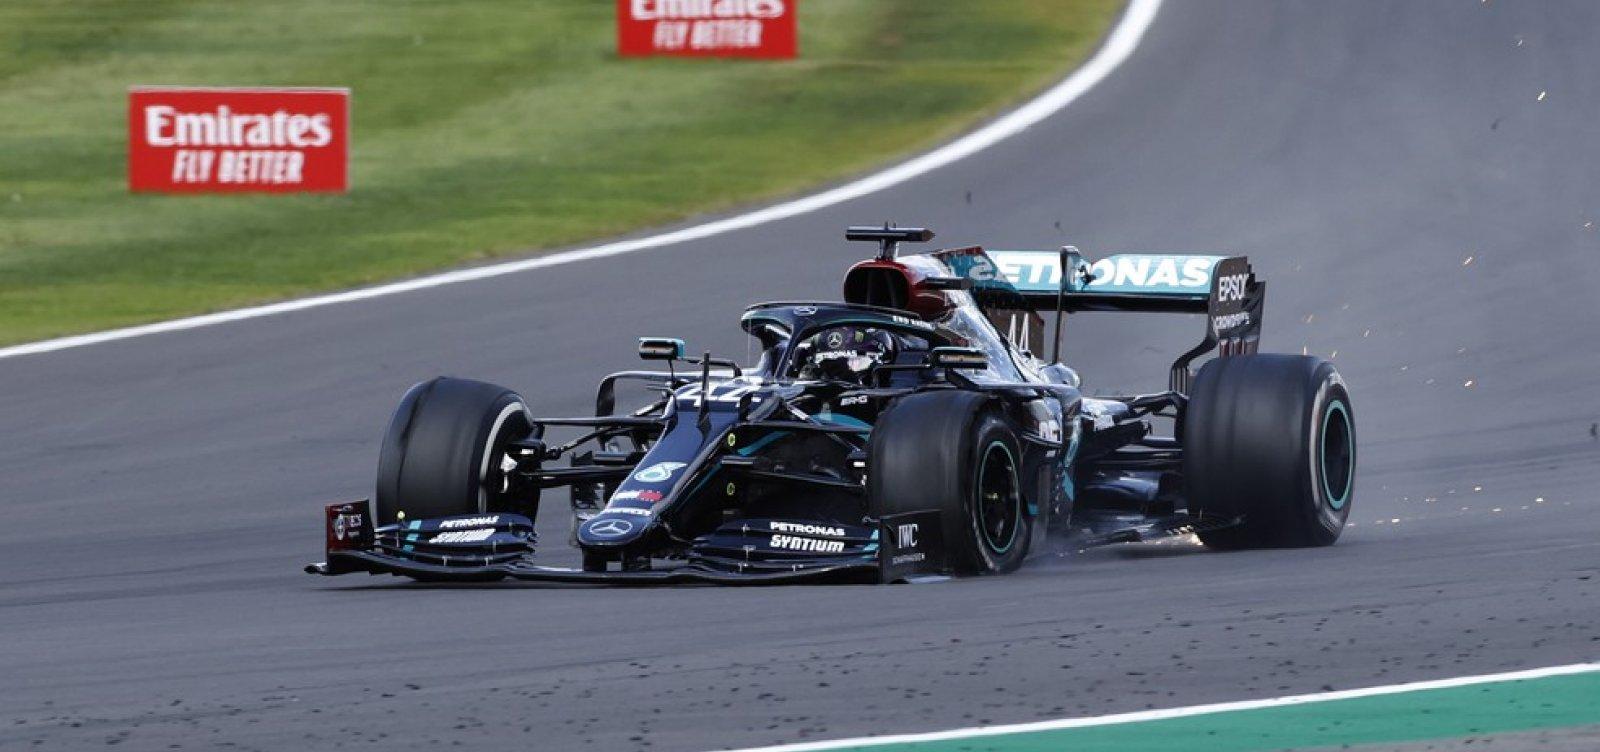 [Hamilton vence GP da Inglaterra após ter pneu furado na última volta]